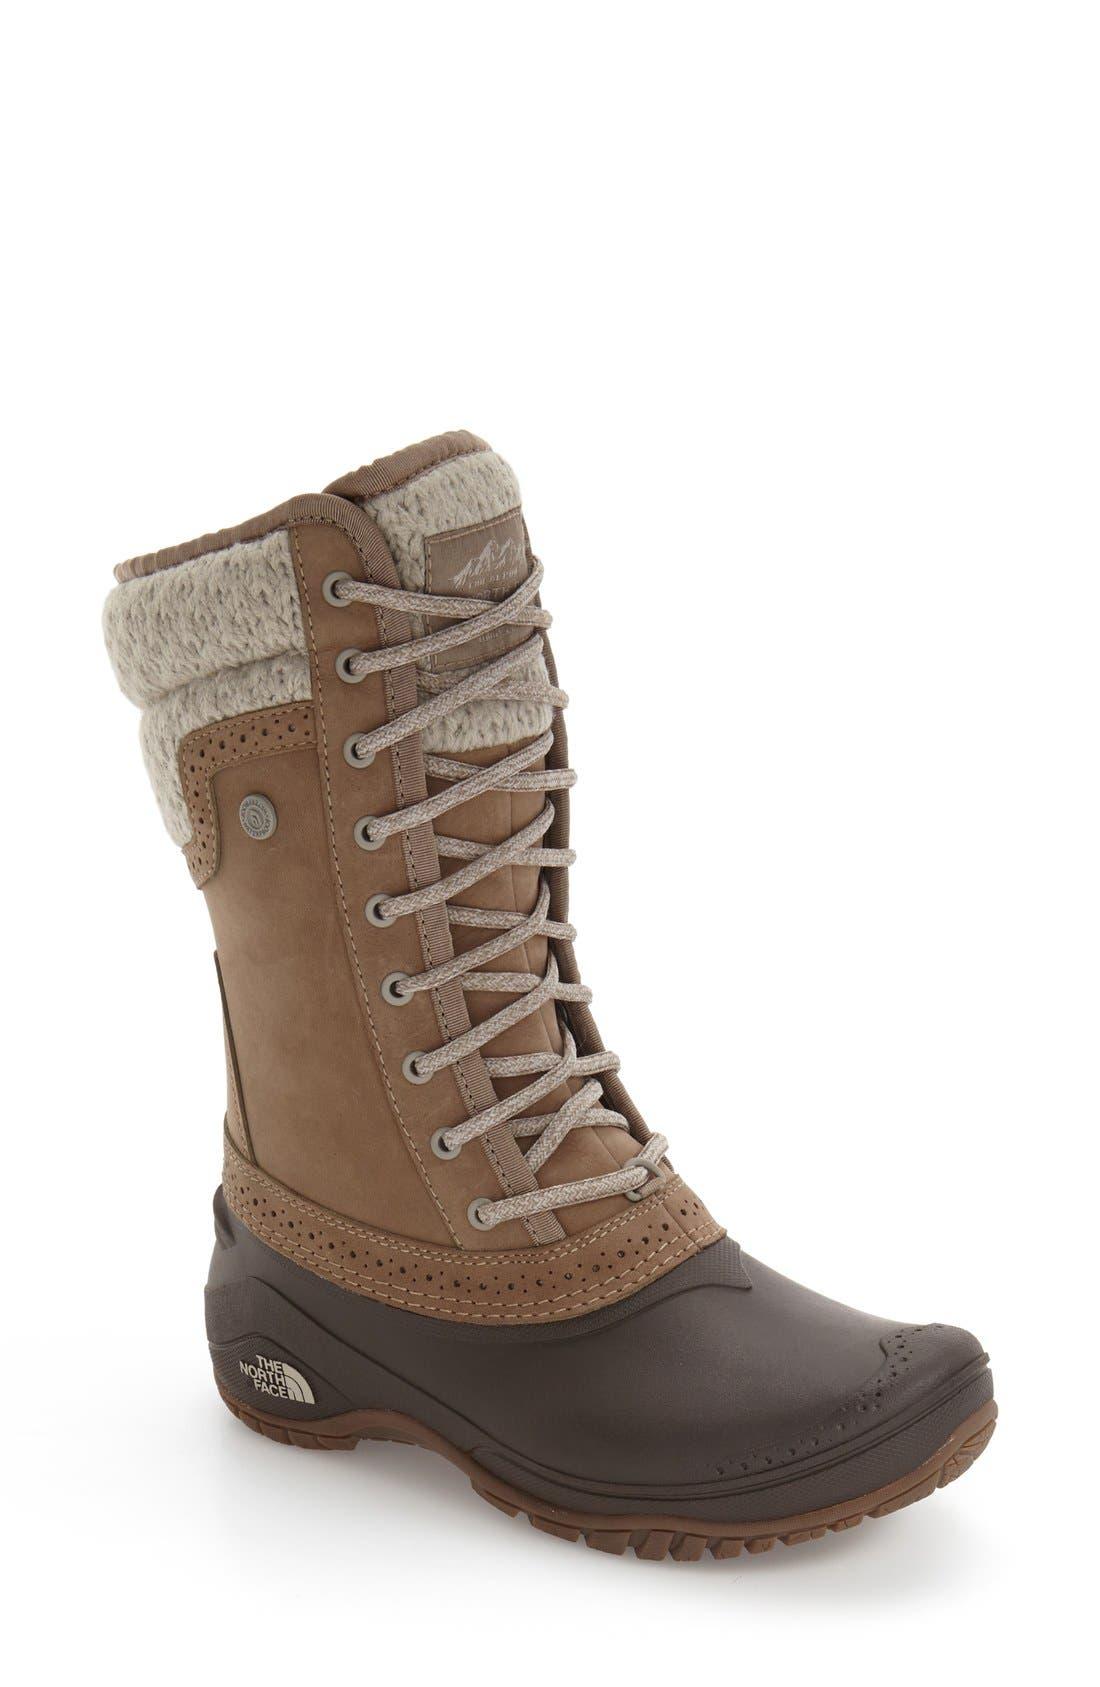 Shellista Waterproof Insulated Snow Boot,                         Main,                         color, Split Rock Brown/ Dove Grey